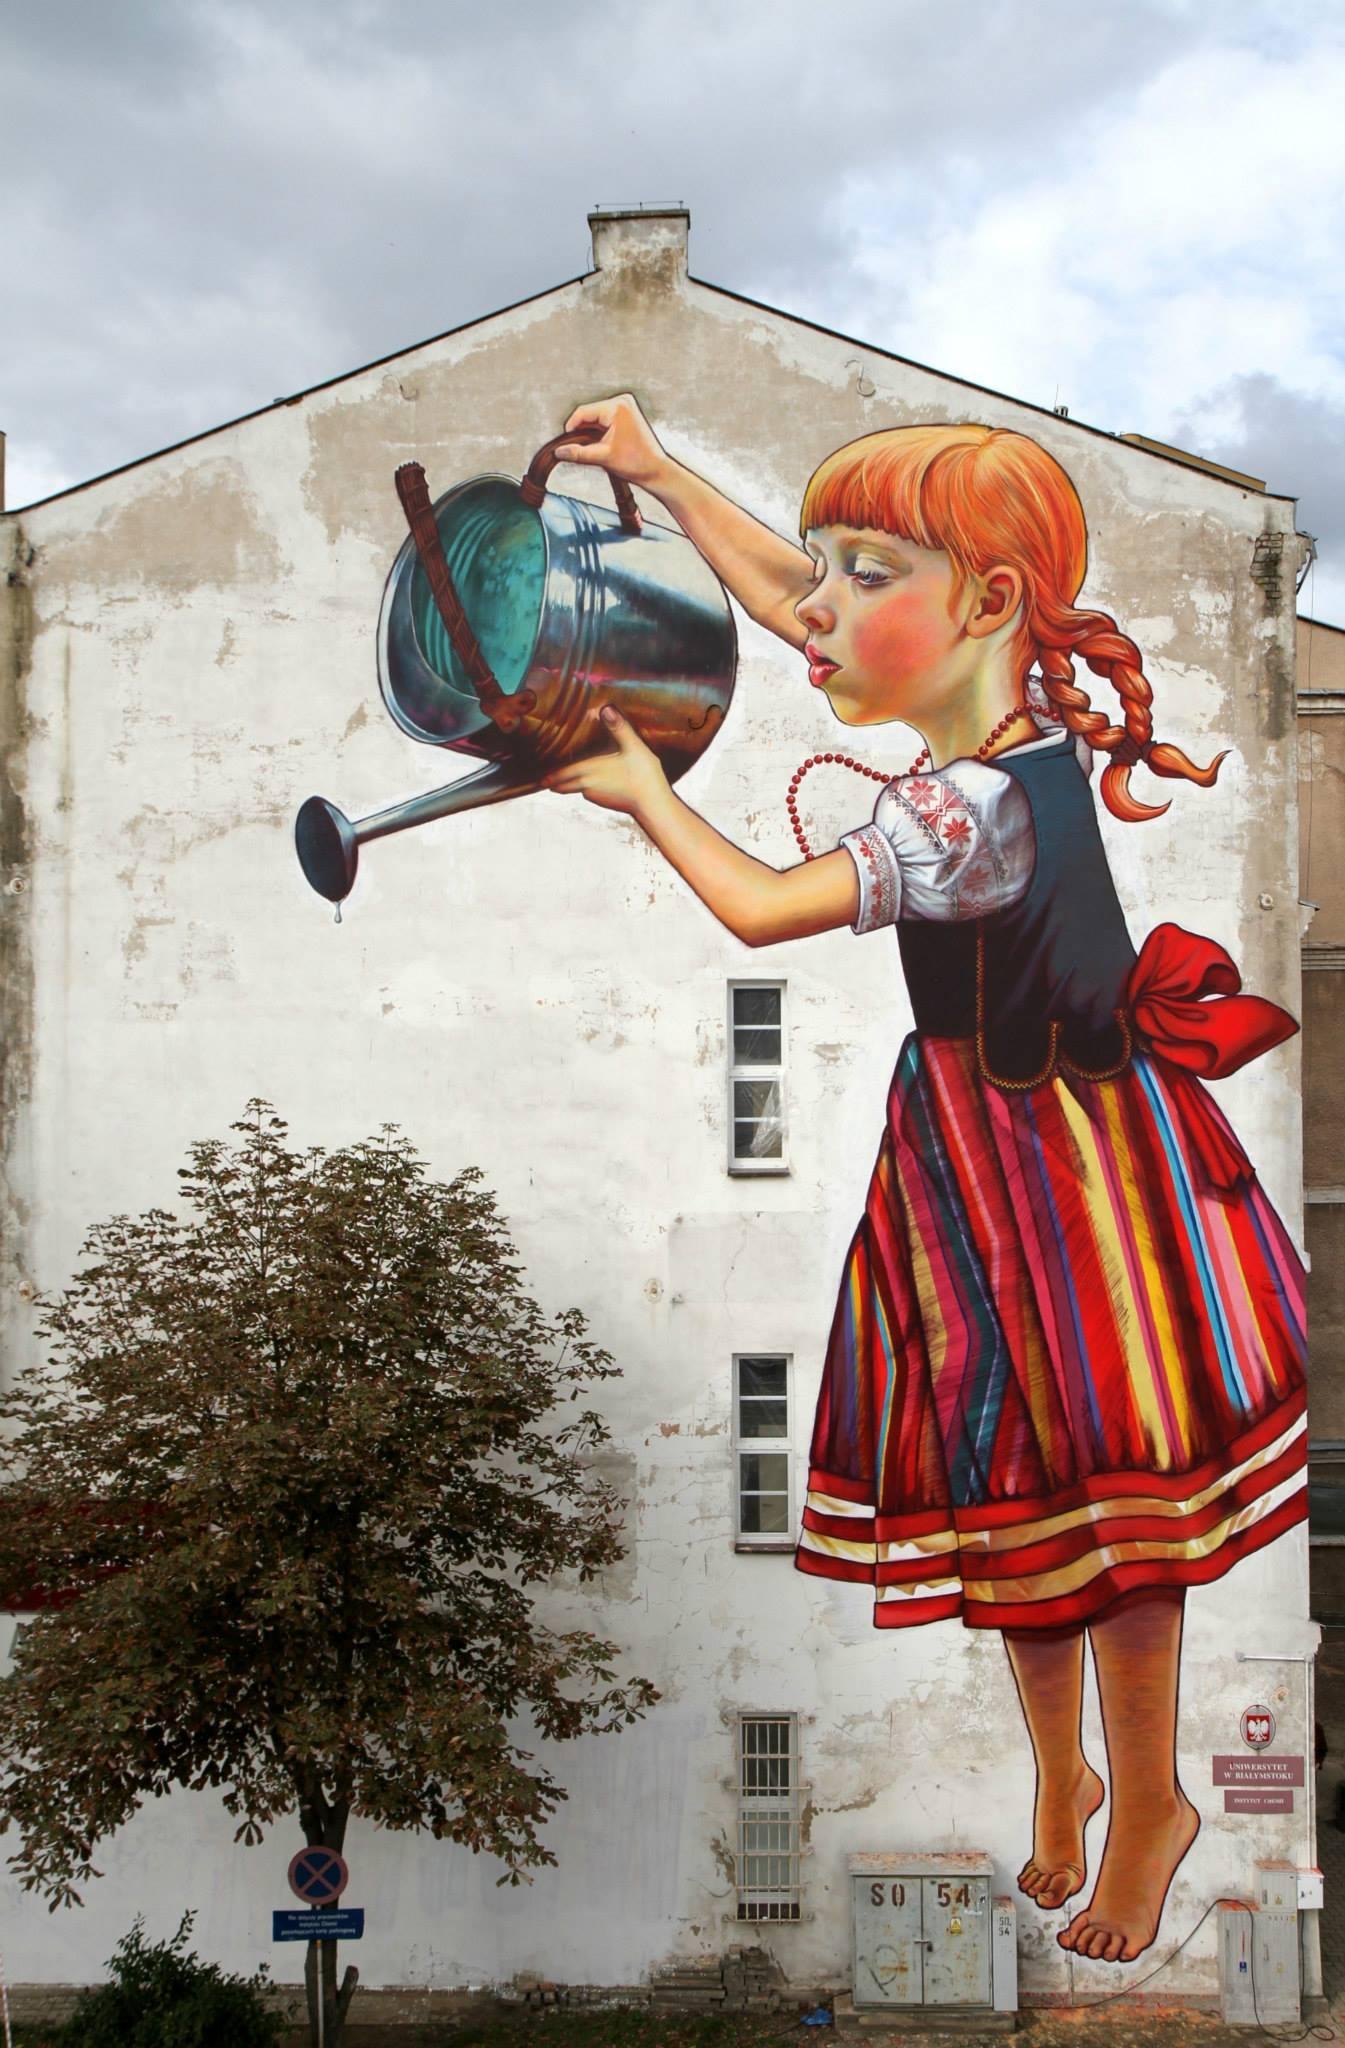 Natalii_Rak_(Polonia)